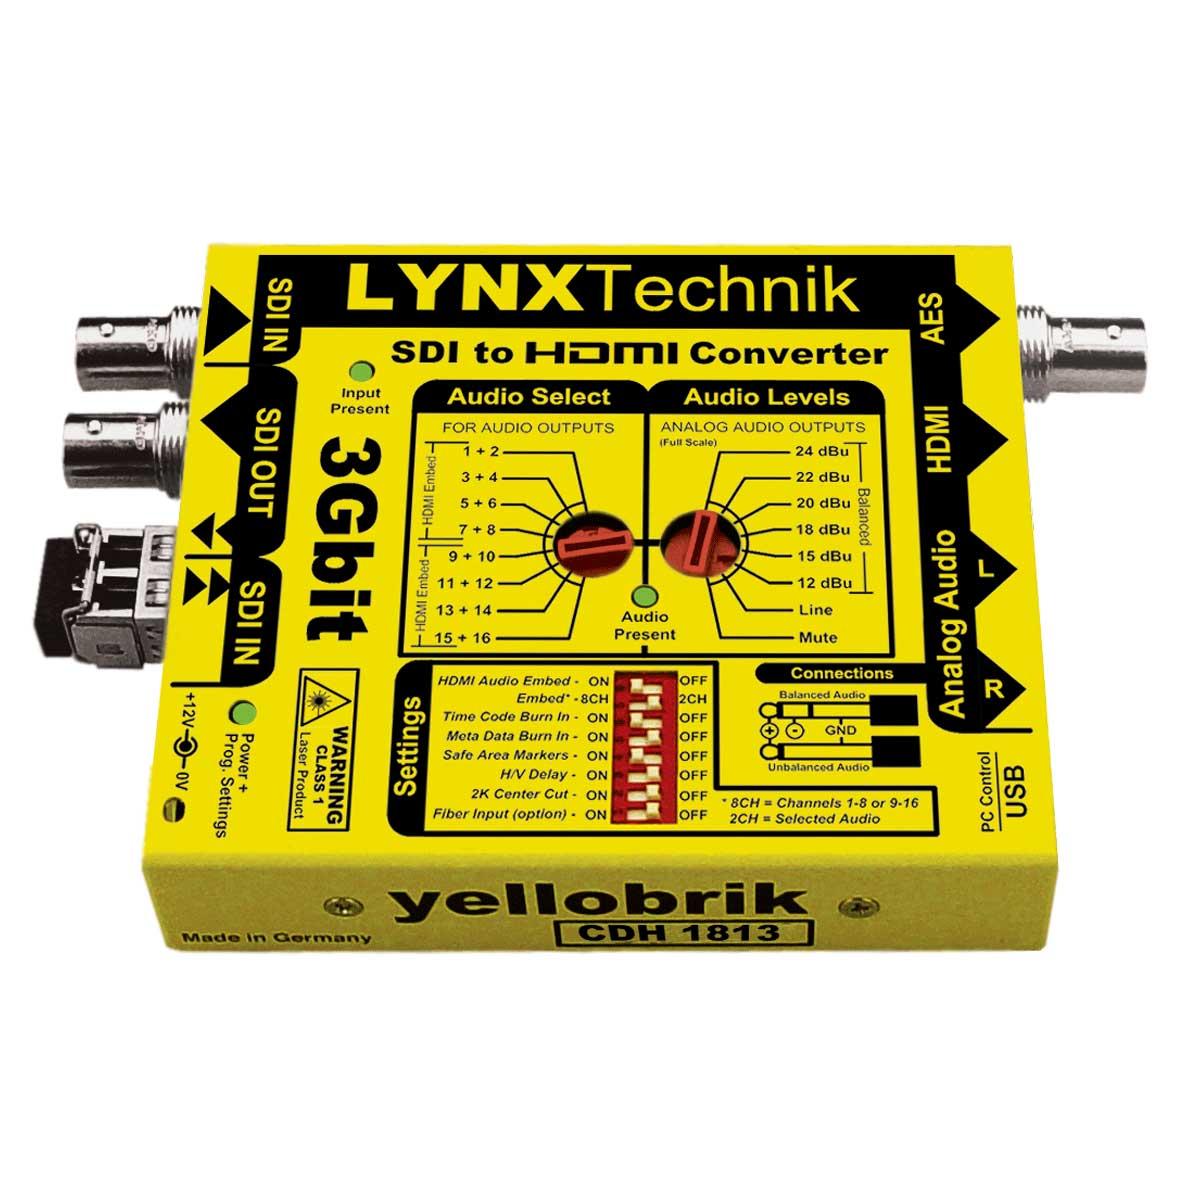 CDH 1813 yellobrik SDI to HDMI Converter